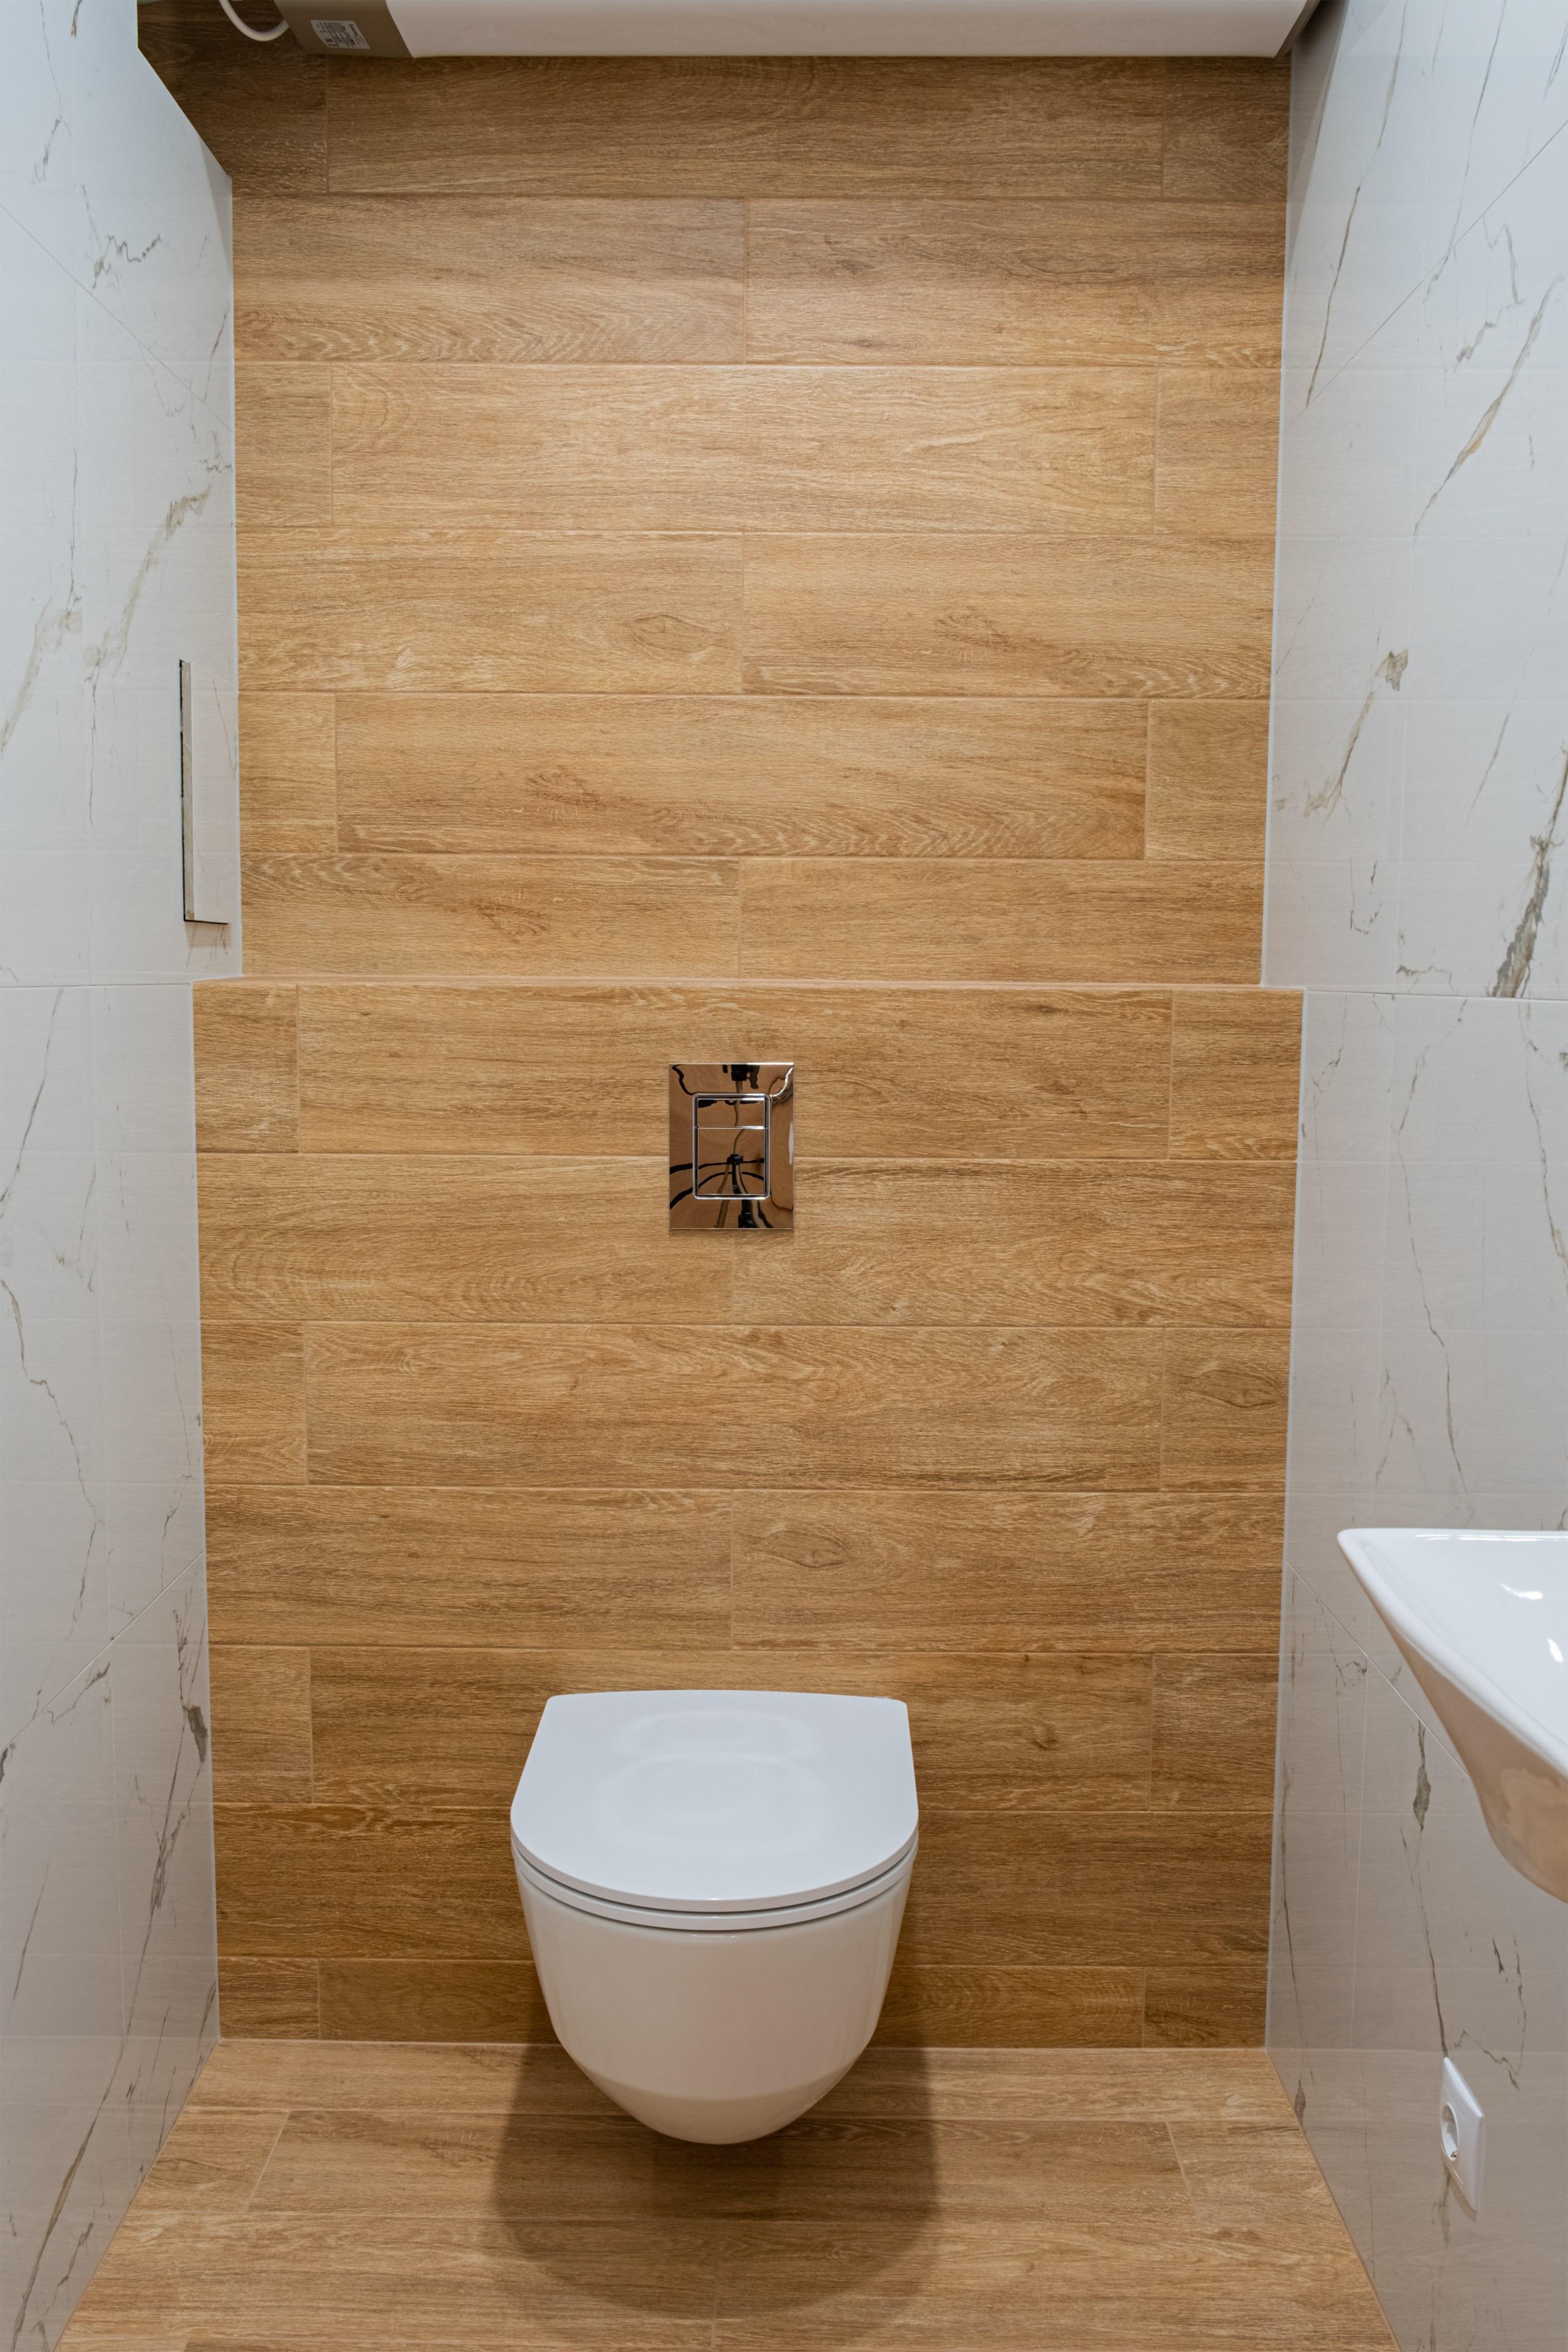 Инсталляция в туалете после ремонта квартиры в Одессе